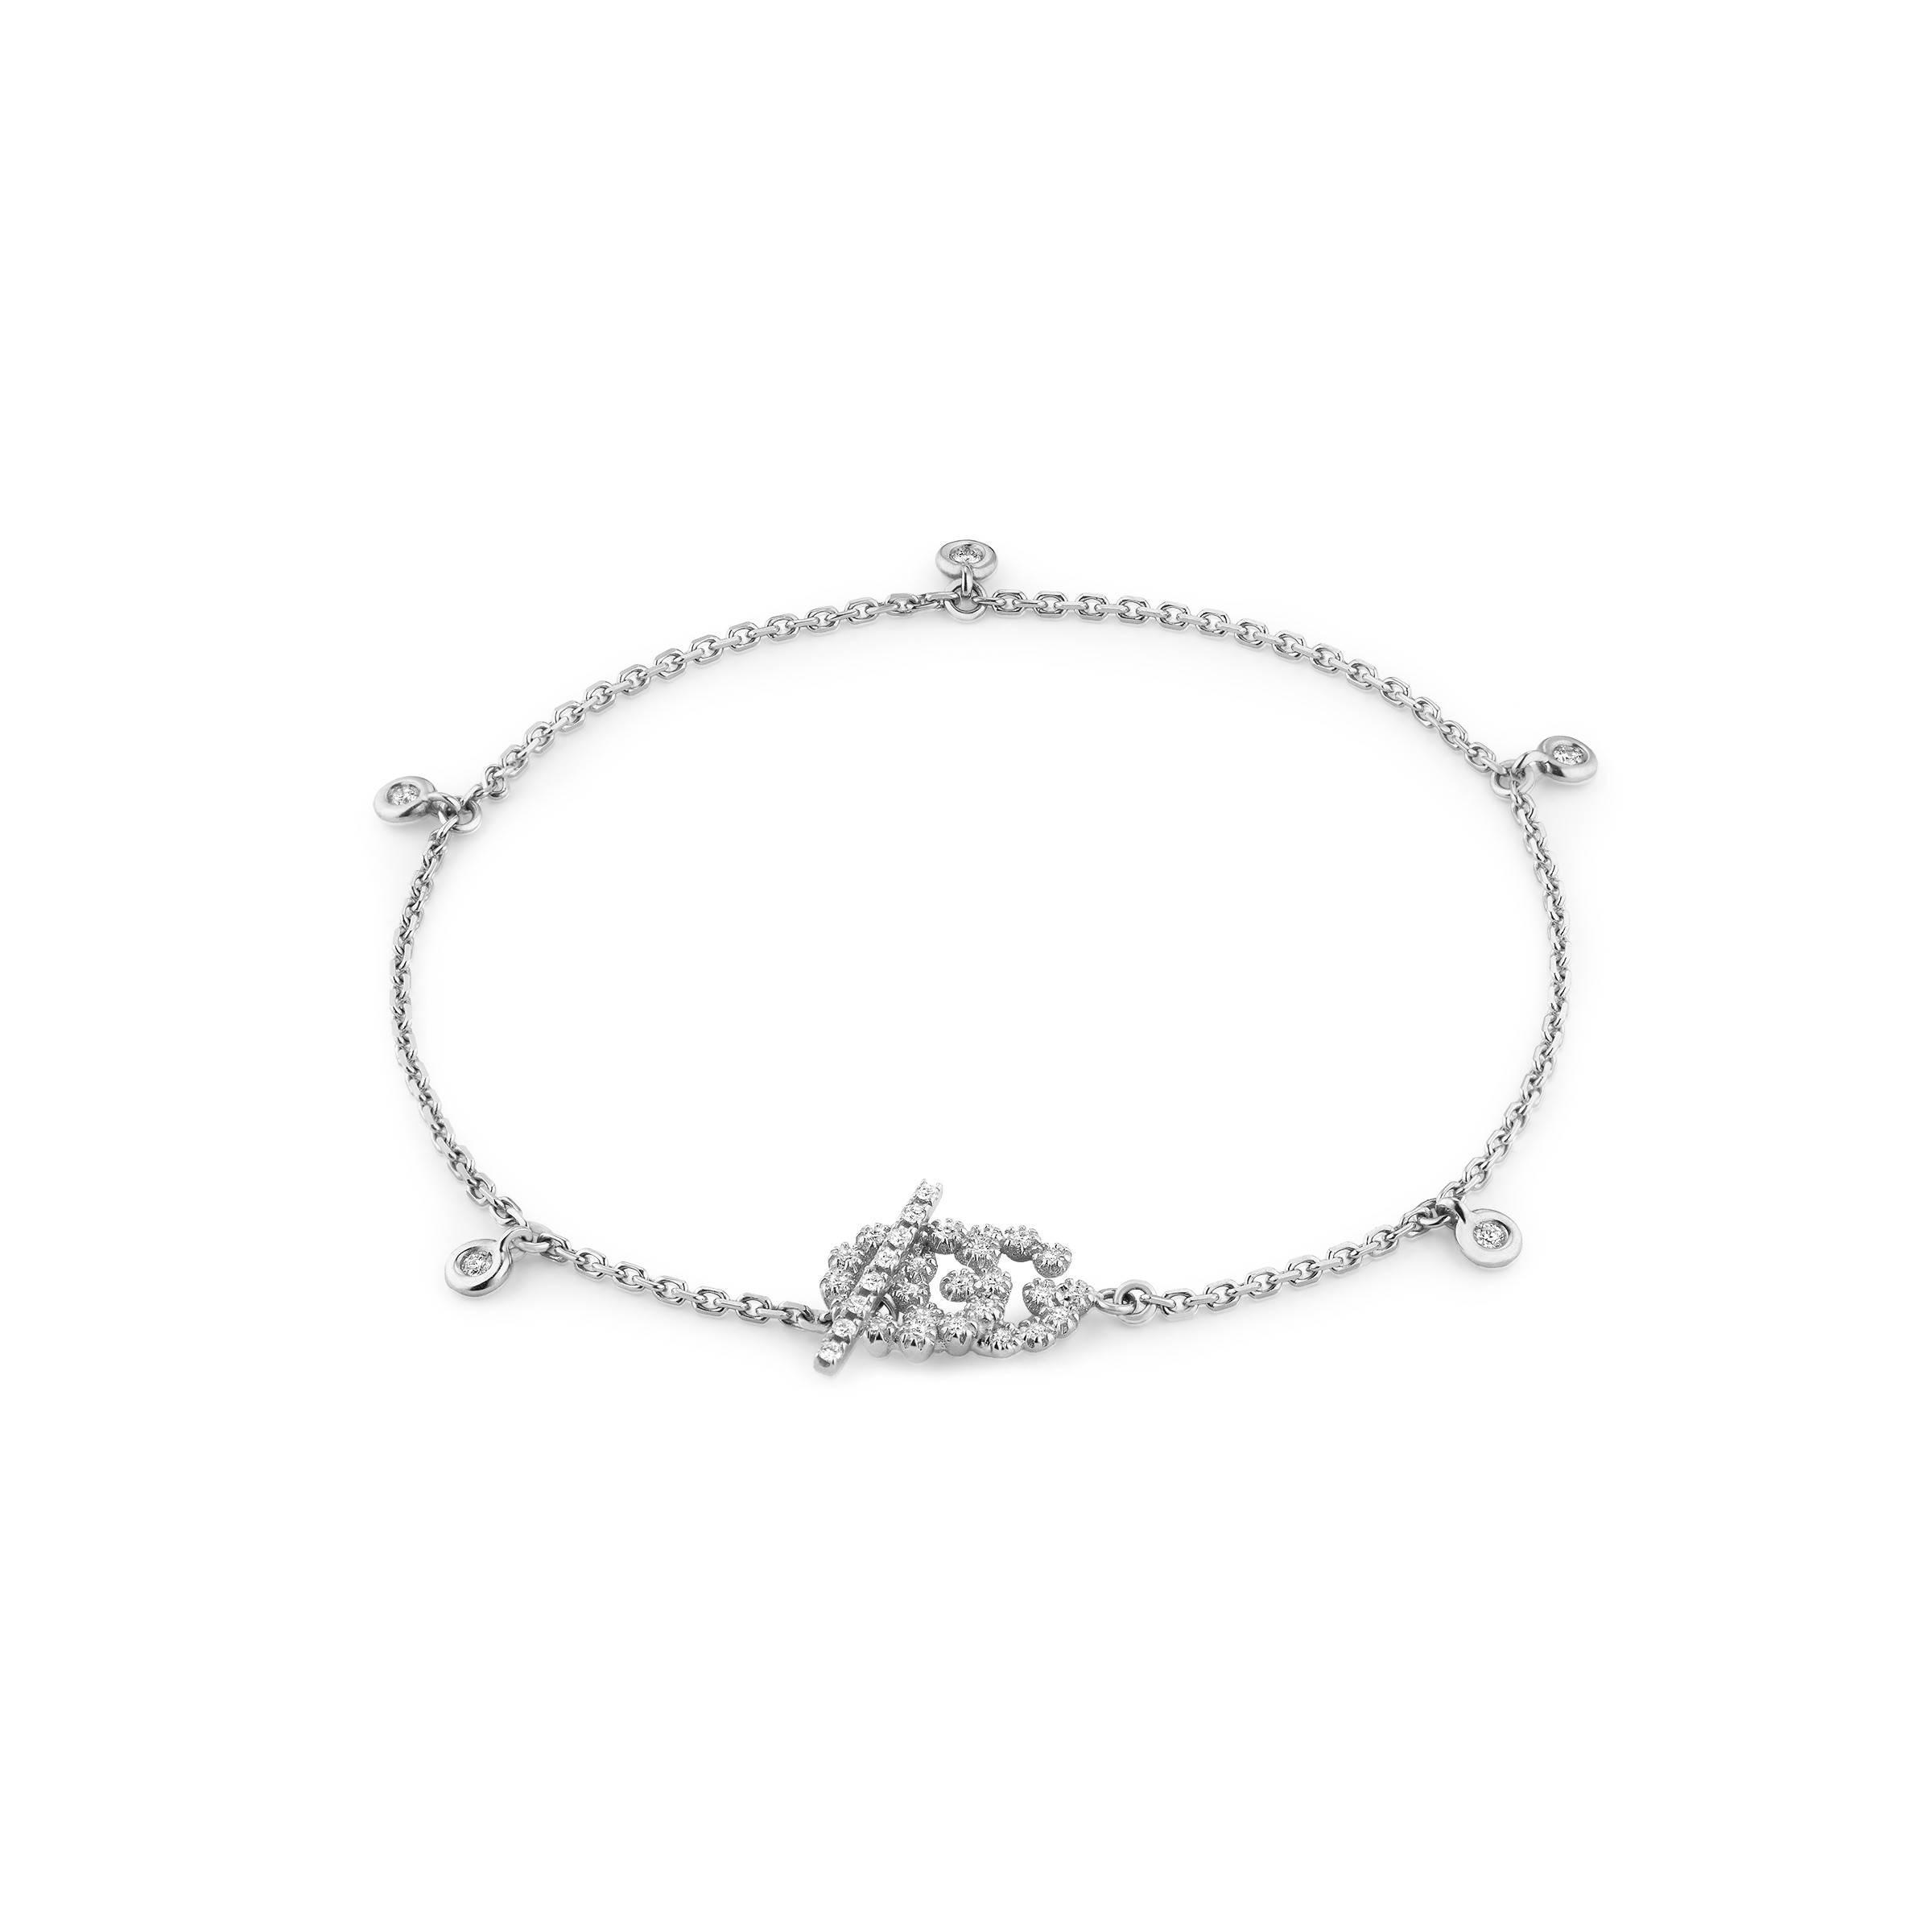 b9efa91a0 Gucci. Brazalete Doble G con Diamantes de mujer de color metálico